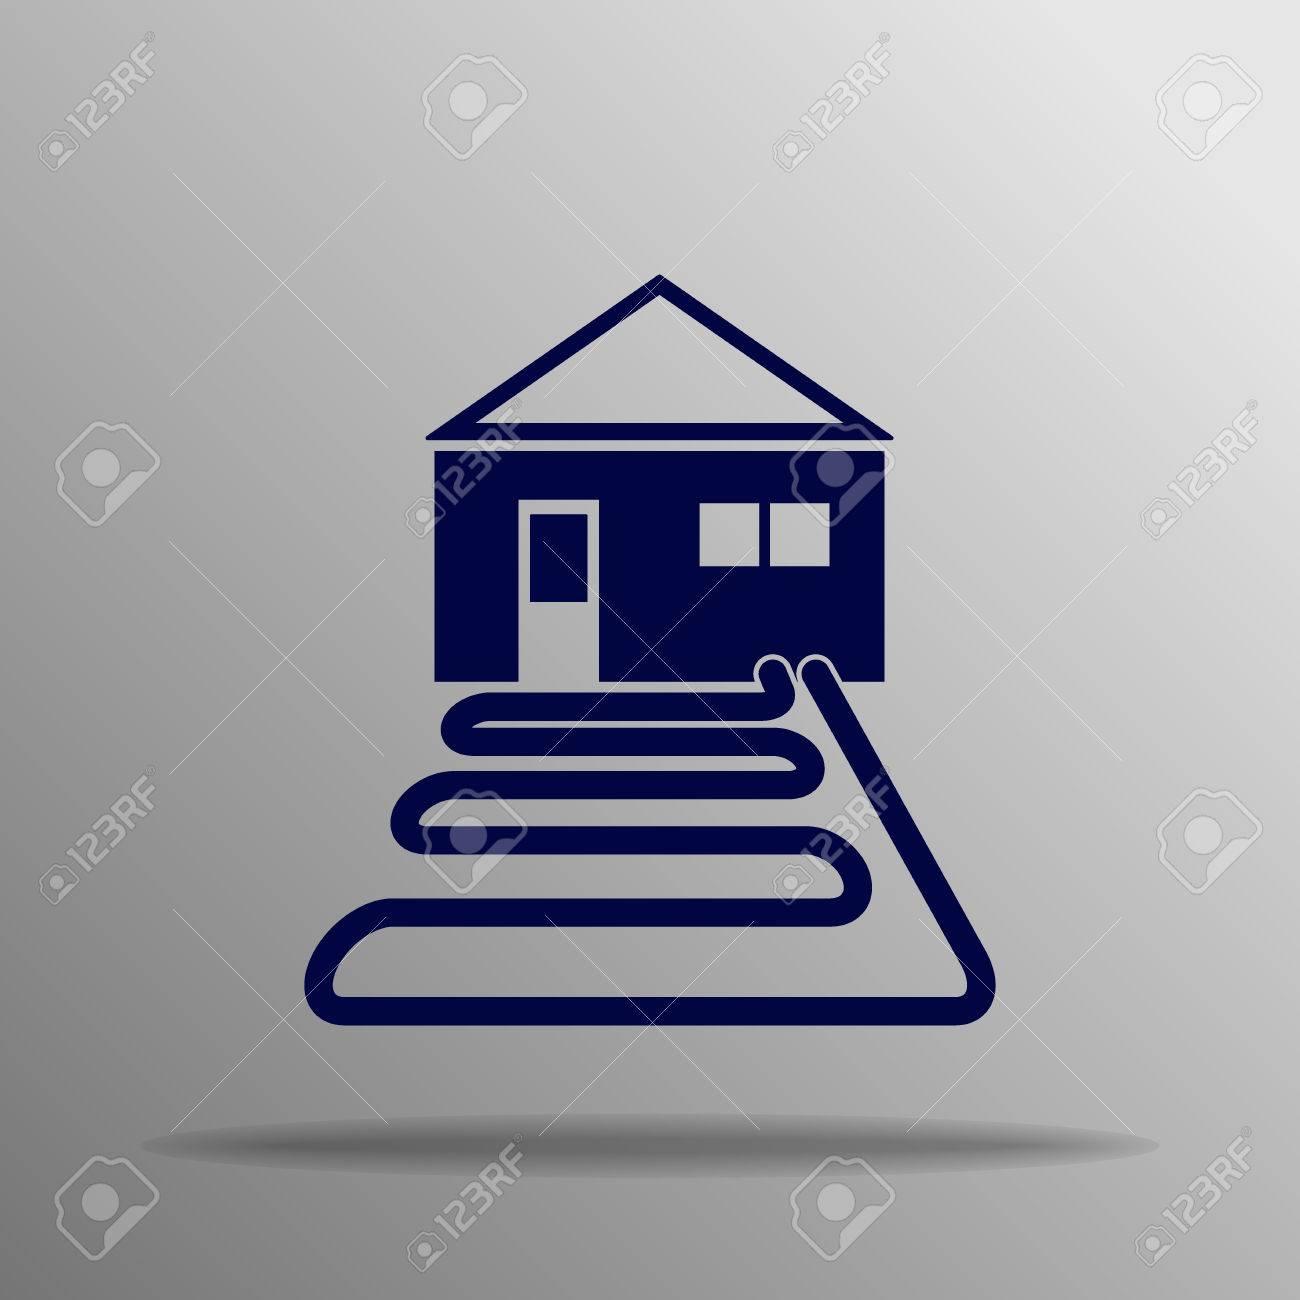 heat pump blue on a gray background - 57826235